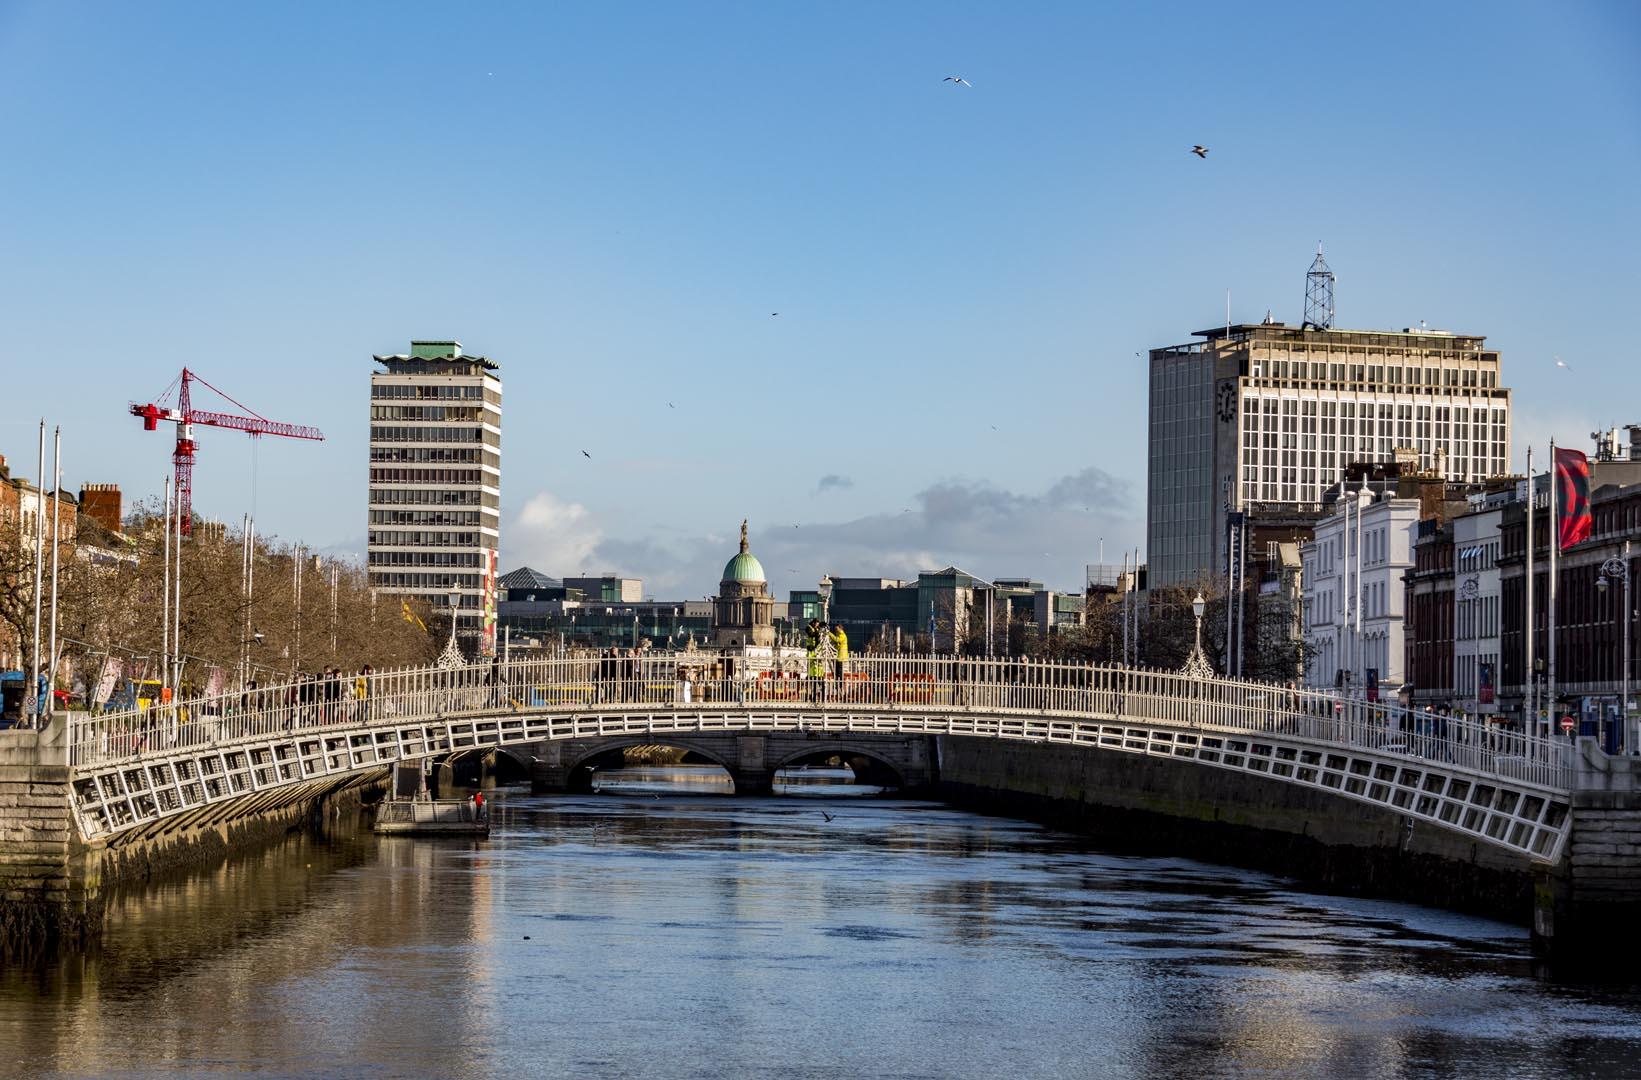 Dublin attractions - Ha'Penny Bridge